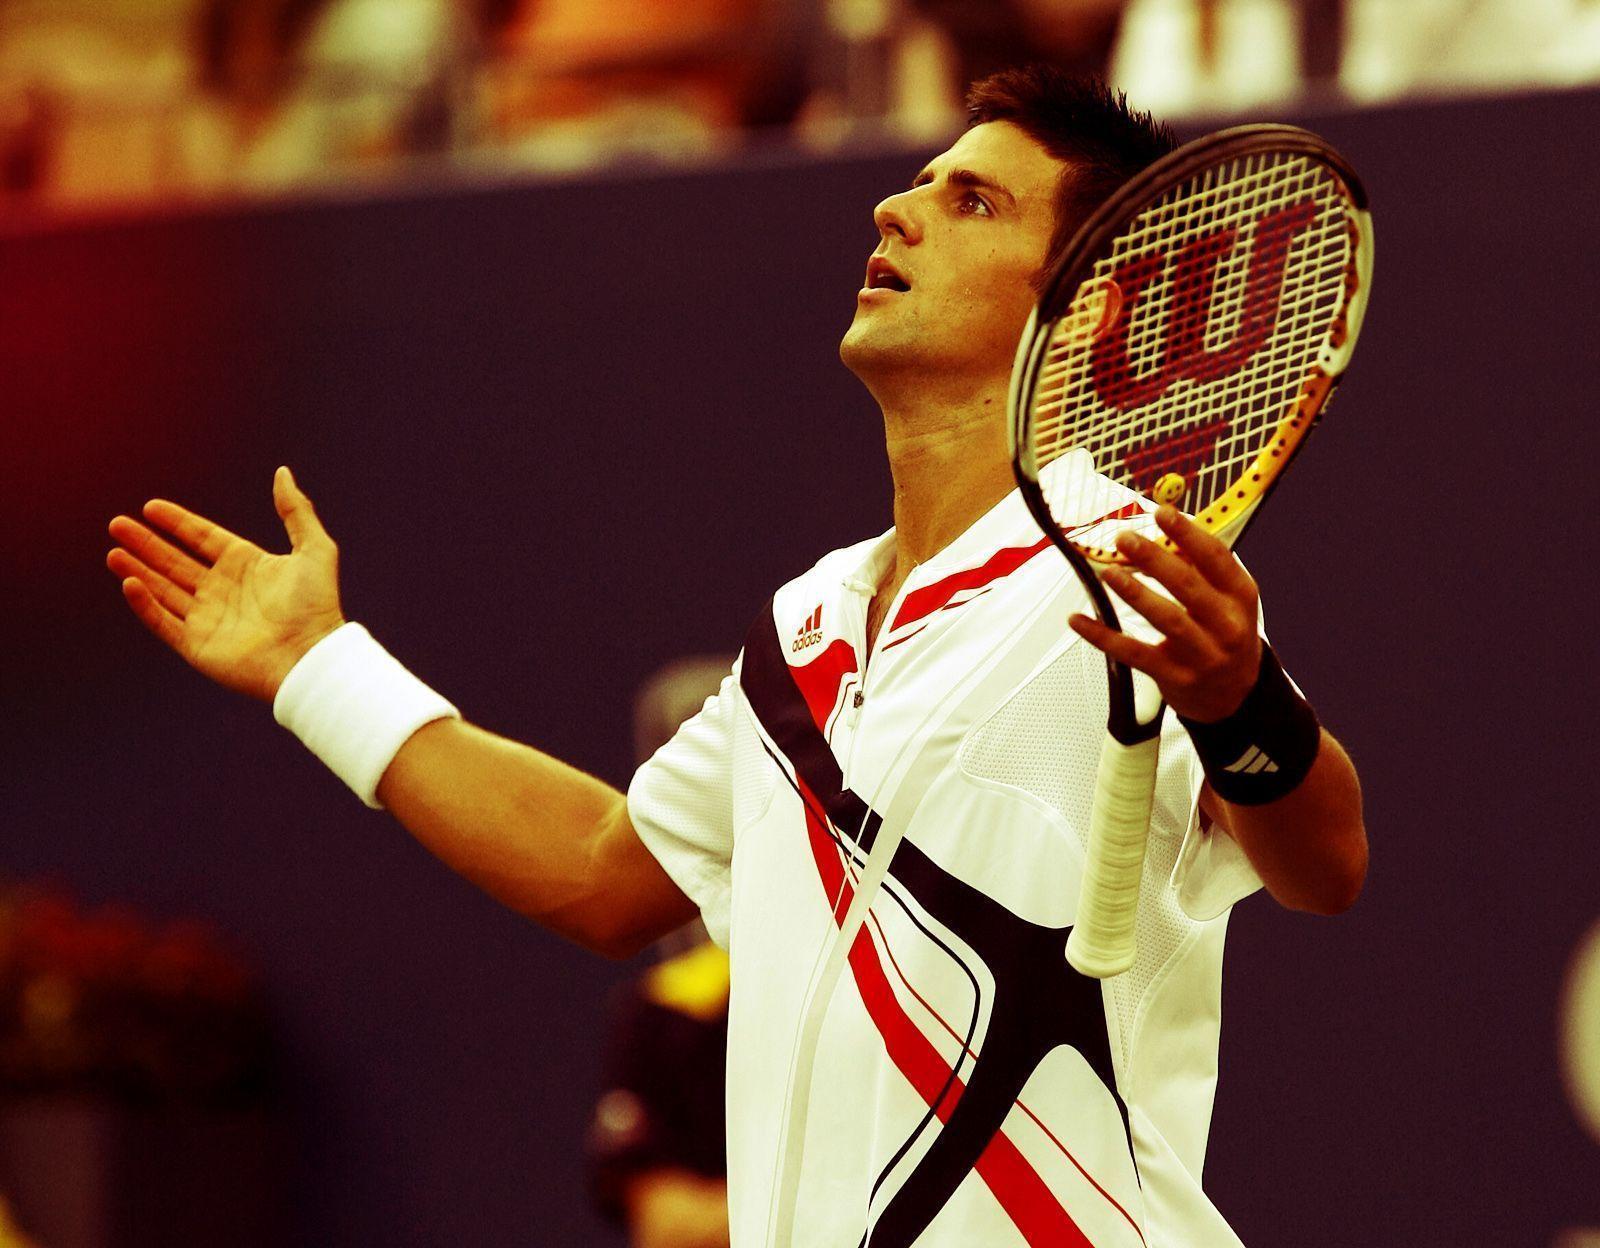 Tennis Player Novak Djokovic HD Wallpapers:wallpapers screensavers